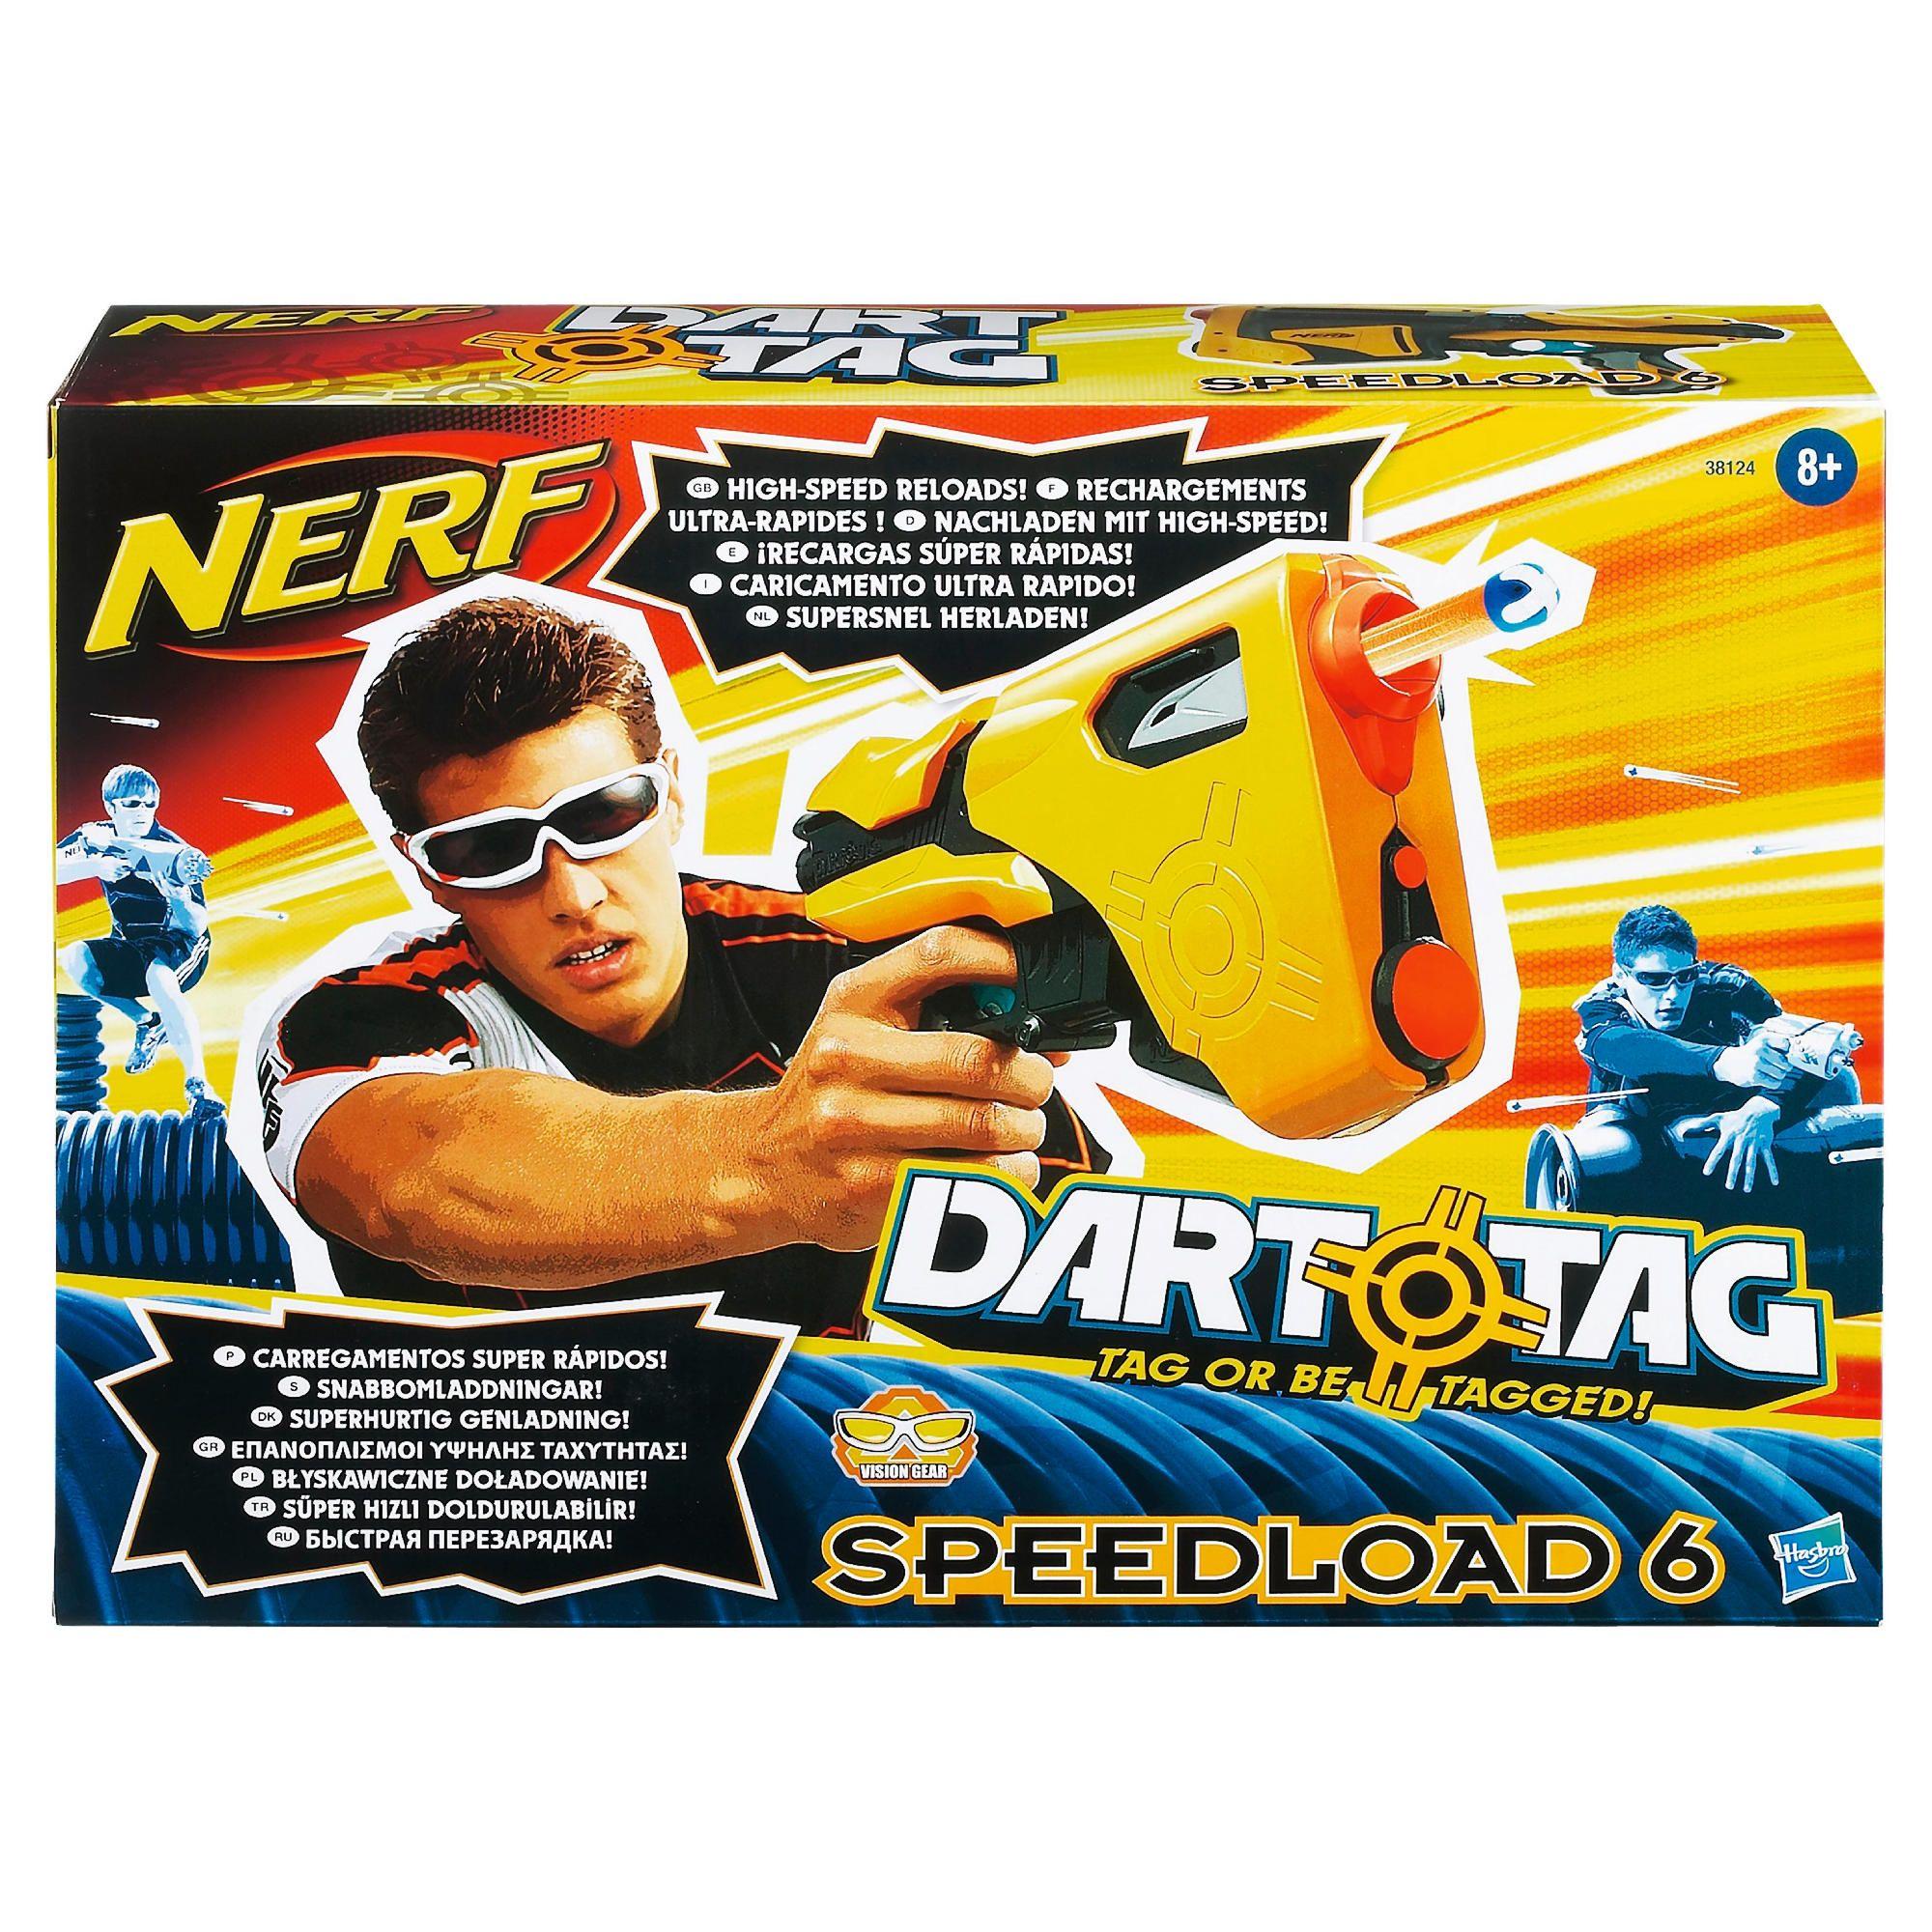 Nerf Dart Tag Speedload Dart Gun